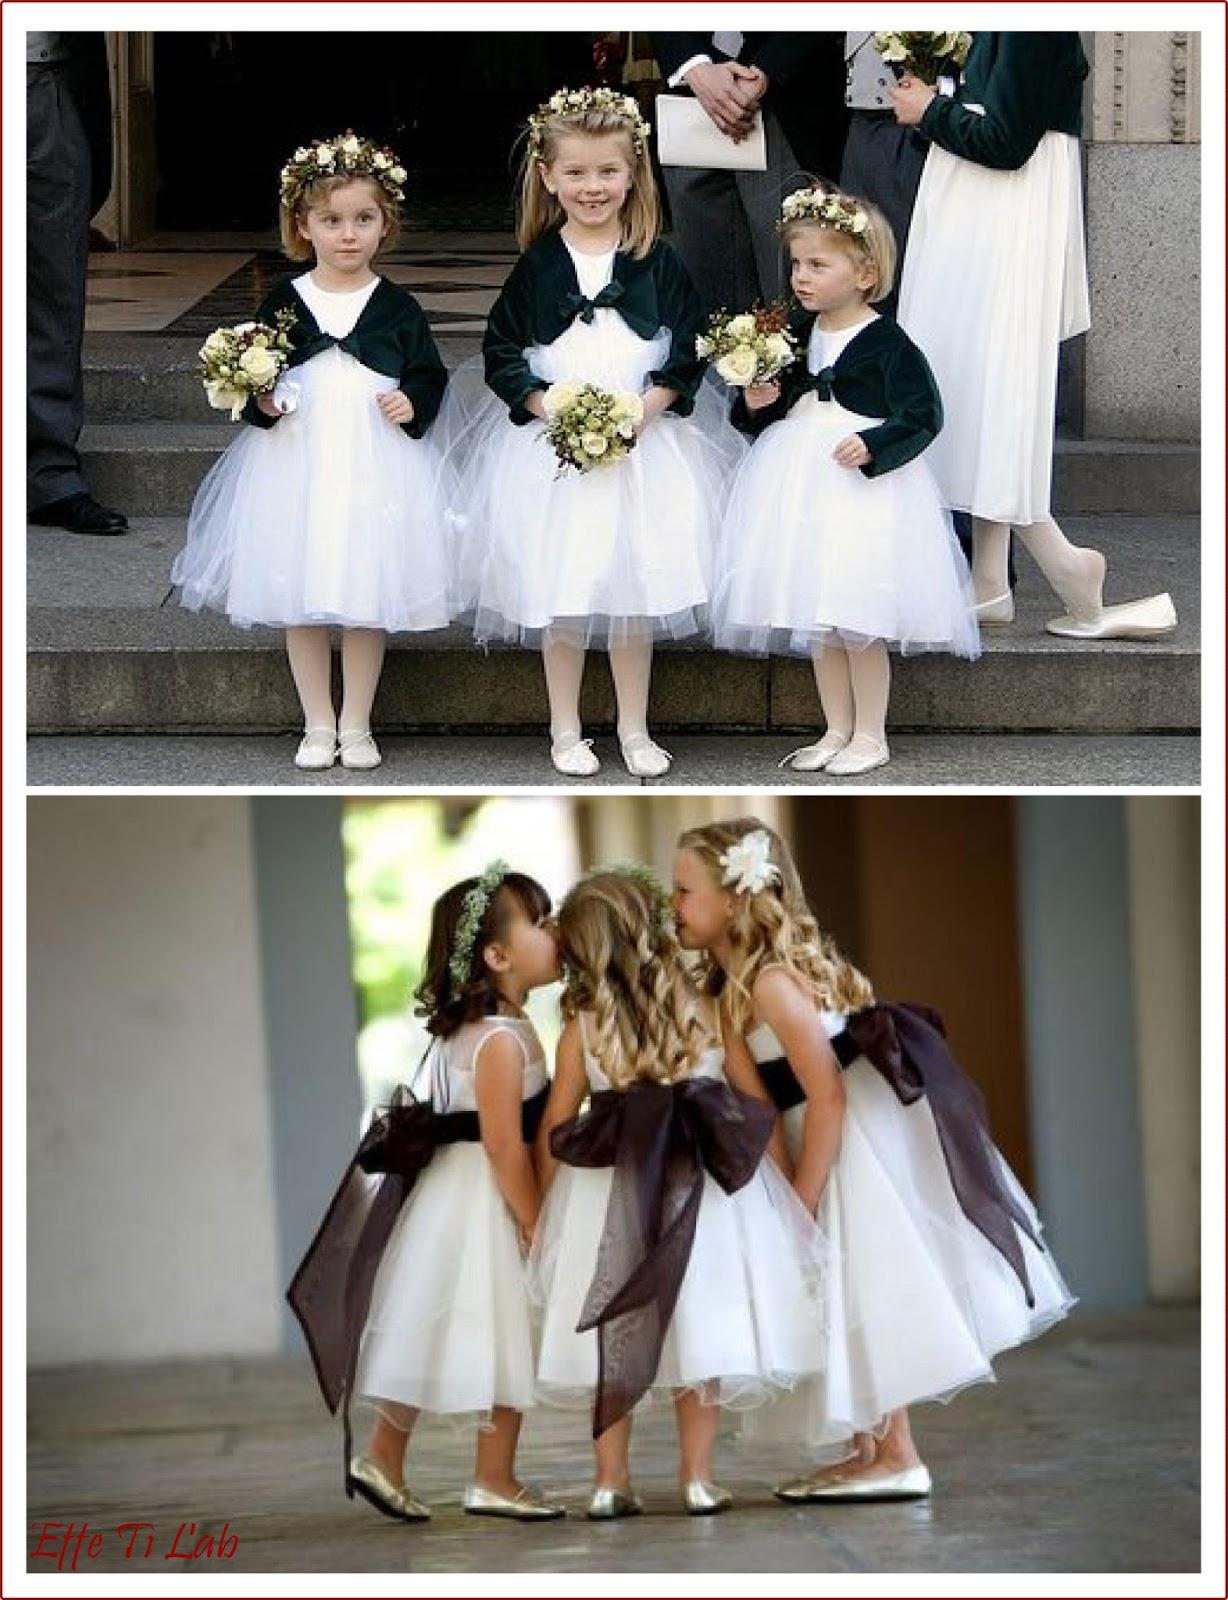 3a754e2e18fe Effe Ti Lab - Wedding and events planner  DAMIGELLE E GARCONS D HONNEUR